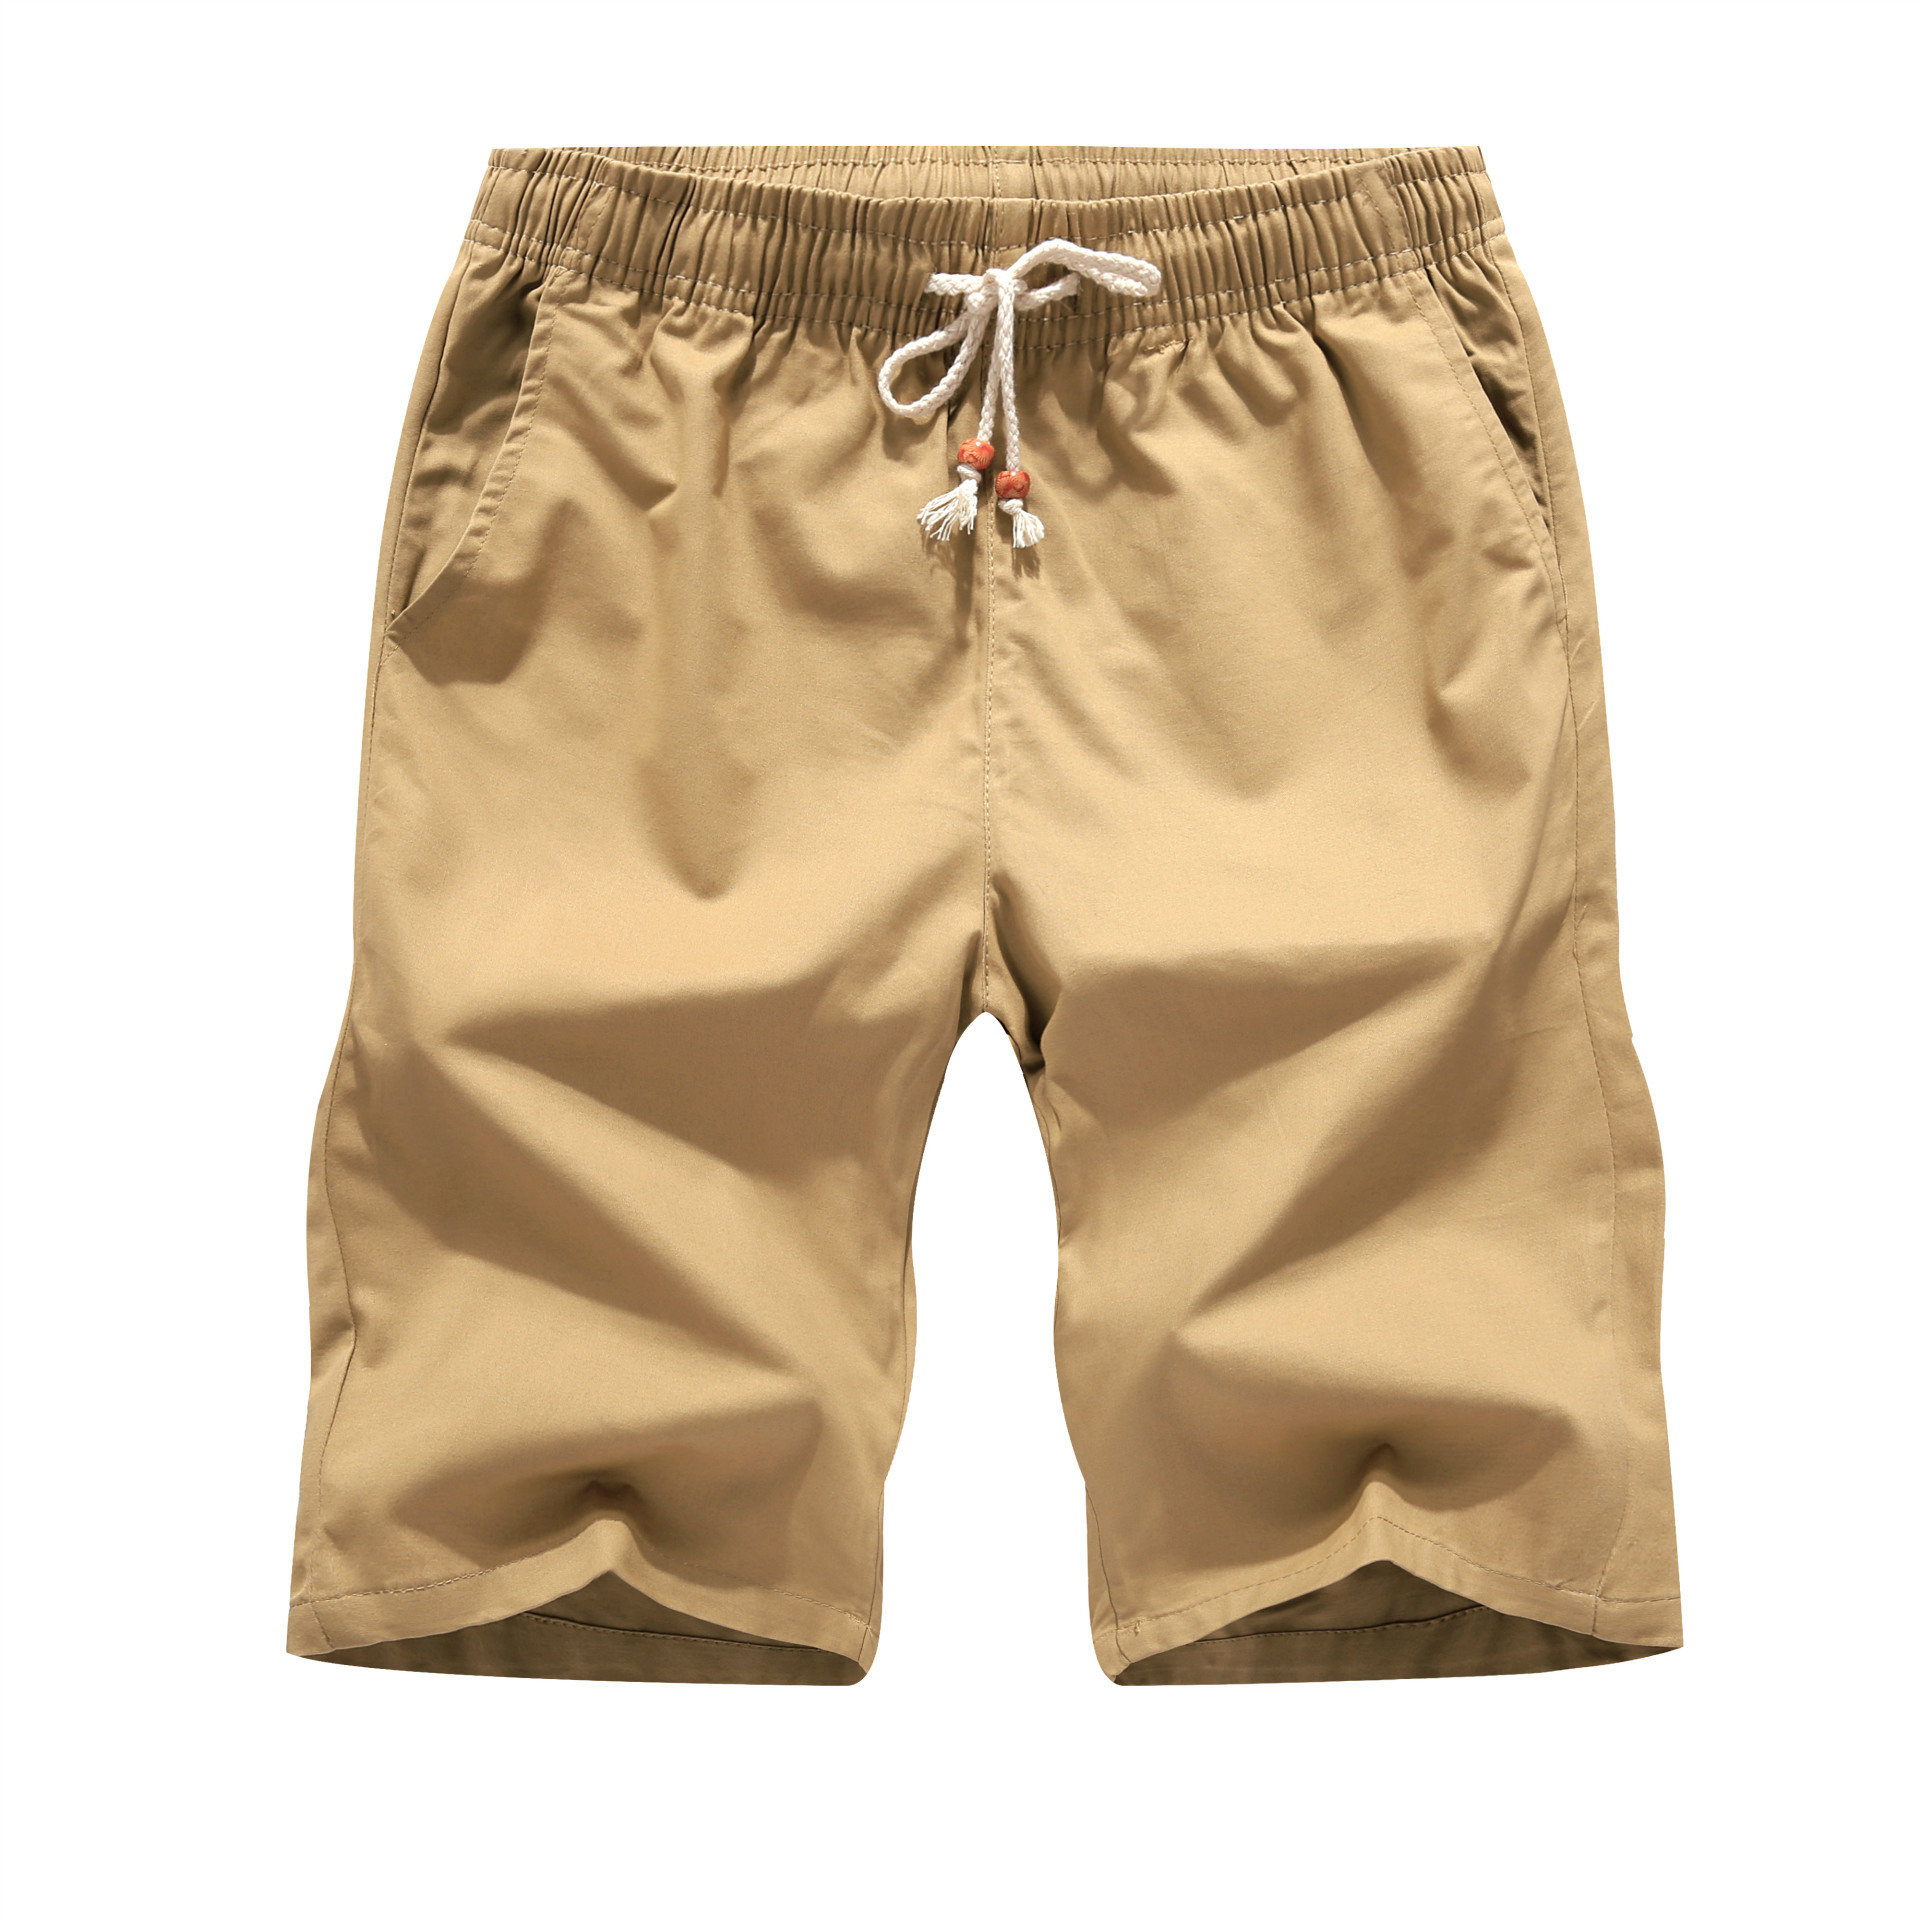 Popular Mens Cotton Shorts Elastic Waist-Buy Cheap Mens Cotton ...